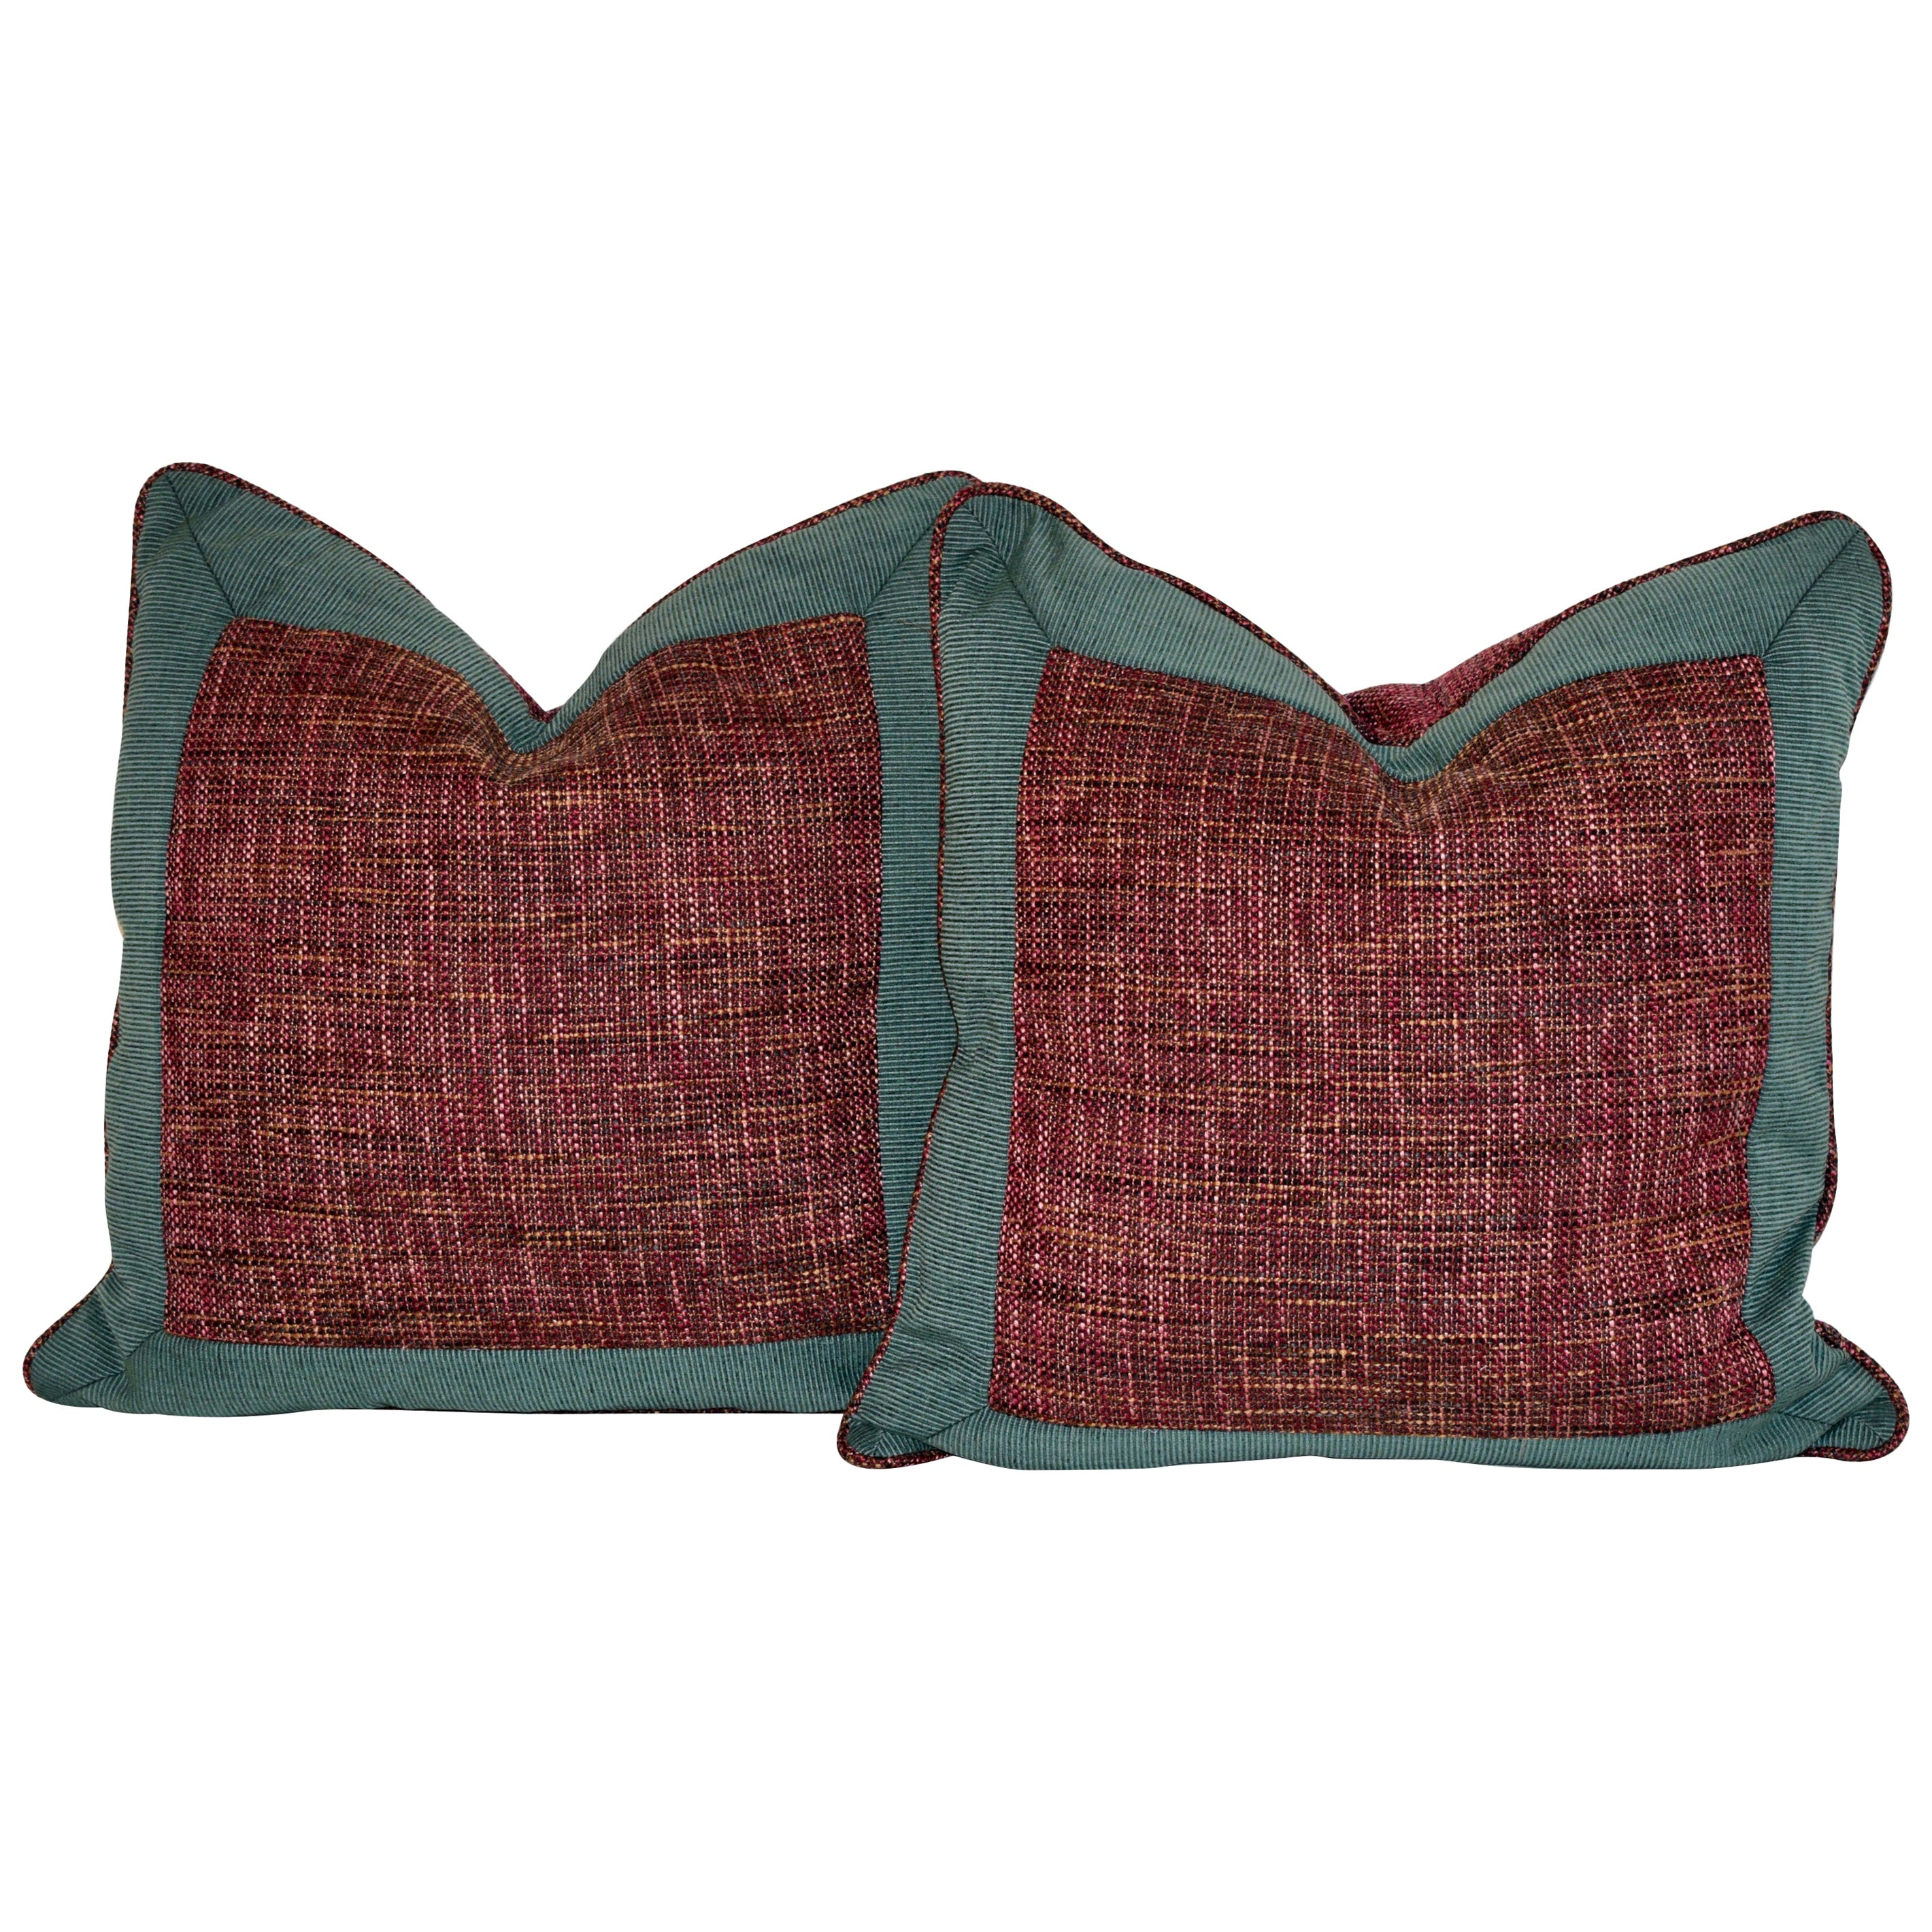 Handmade Bordered Pillows